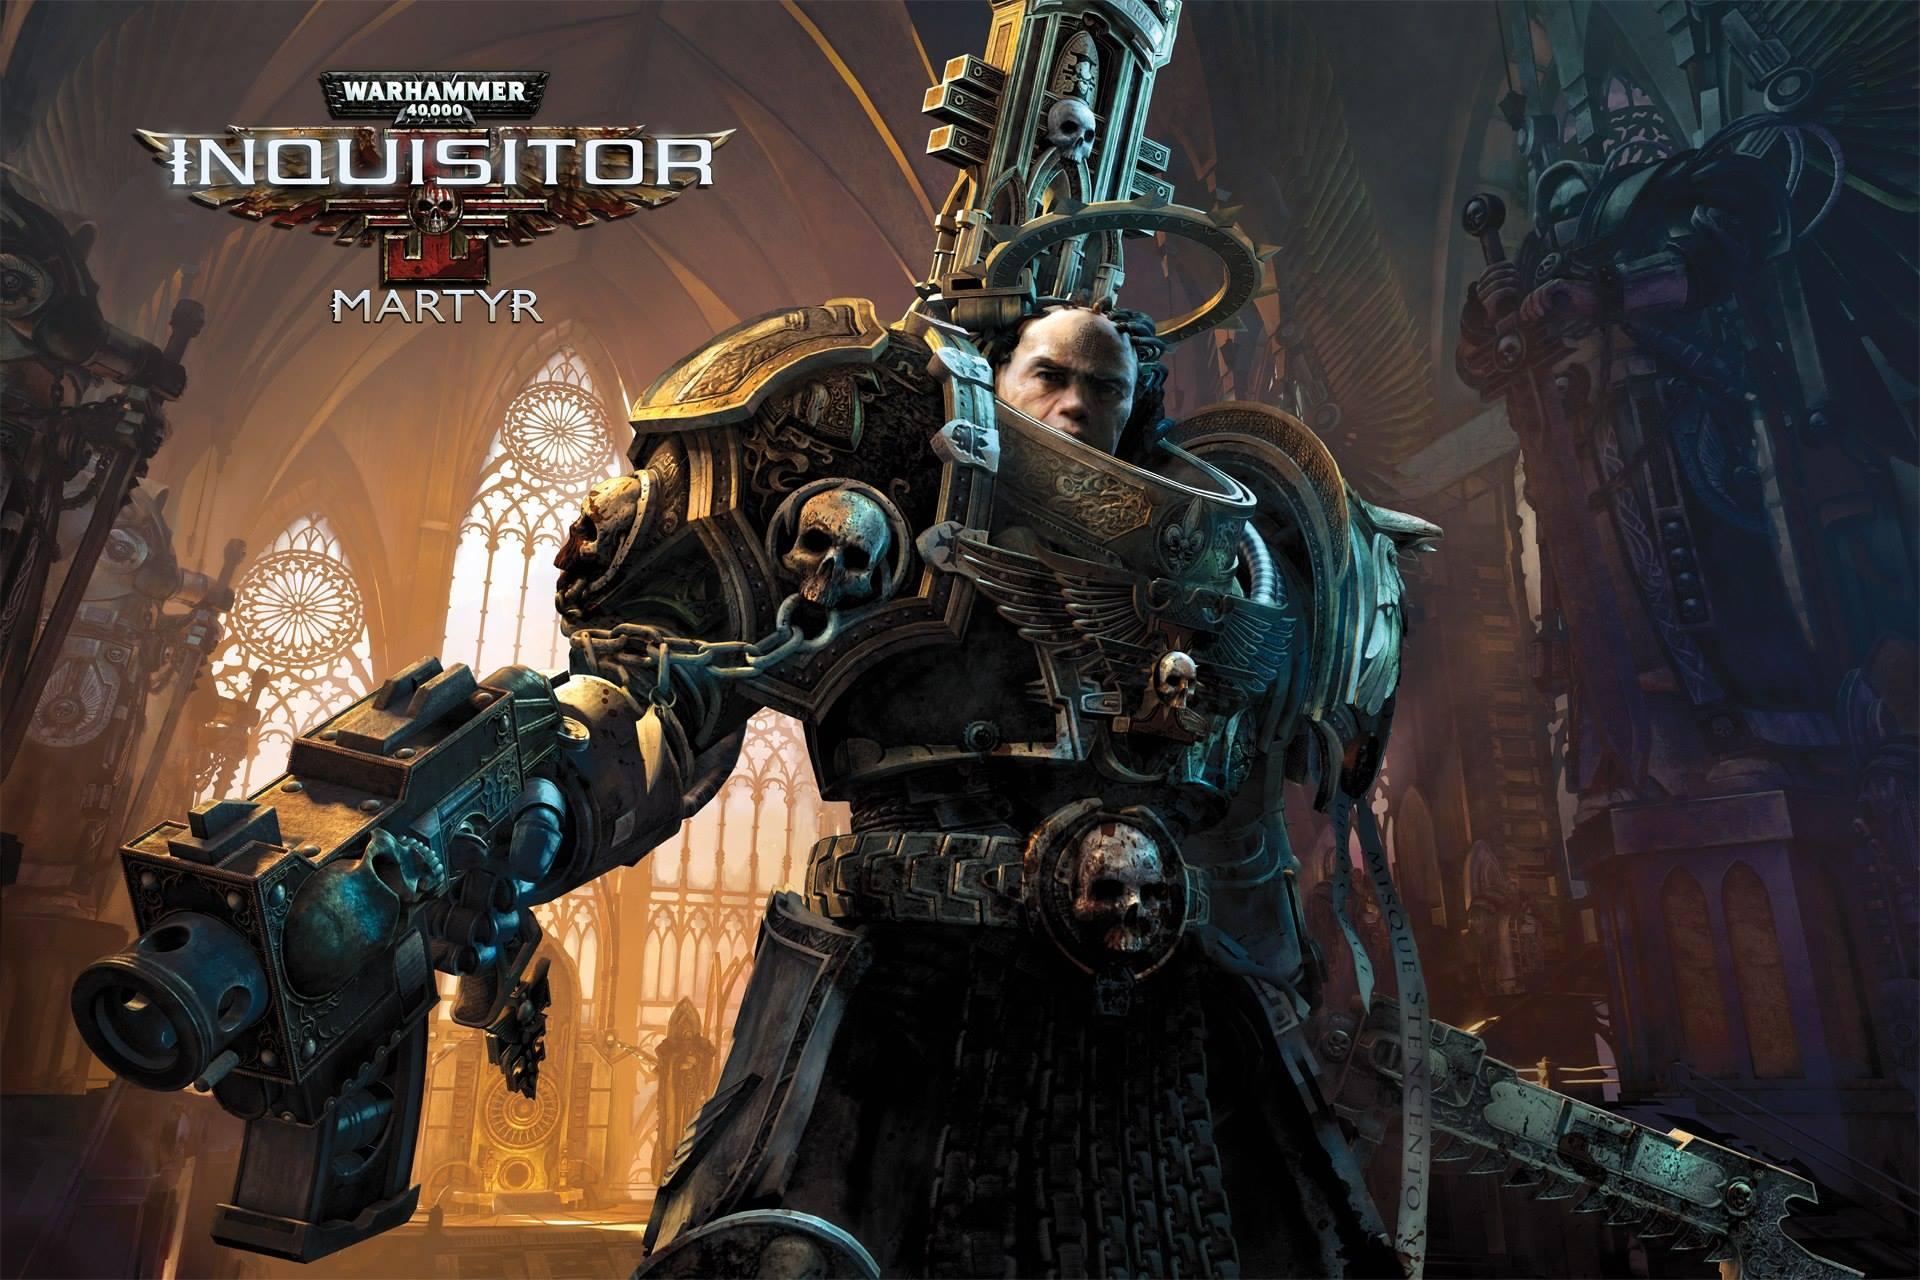 [Jeu vidéo] Warhammer 40,000: Inquisitor – Martyr 311733118163538696653264022716387259844027885912o